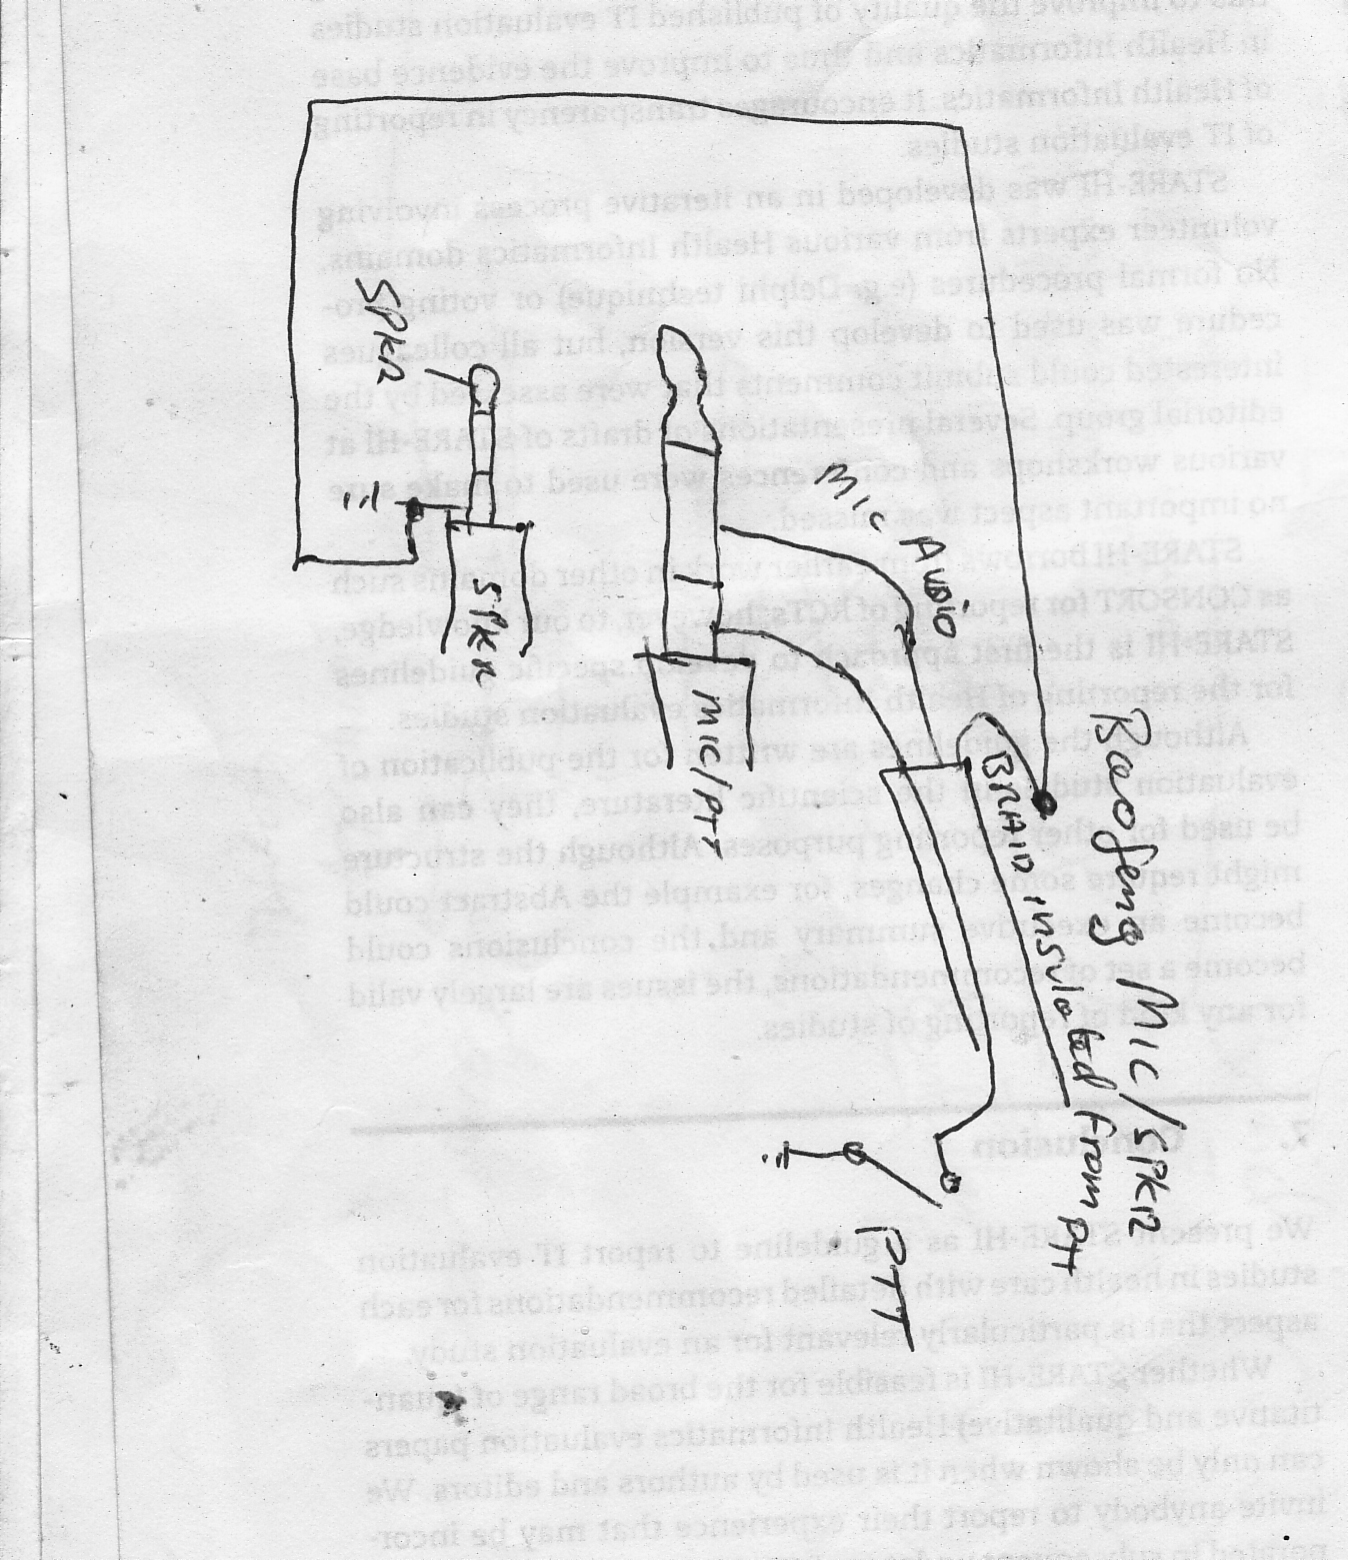 Baofeng UV 5r and similar mic /spkr wiring explained